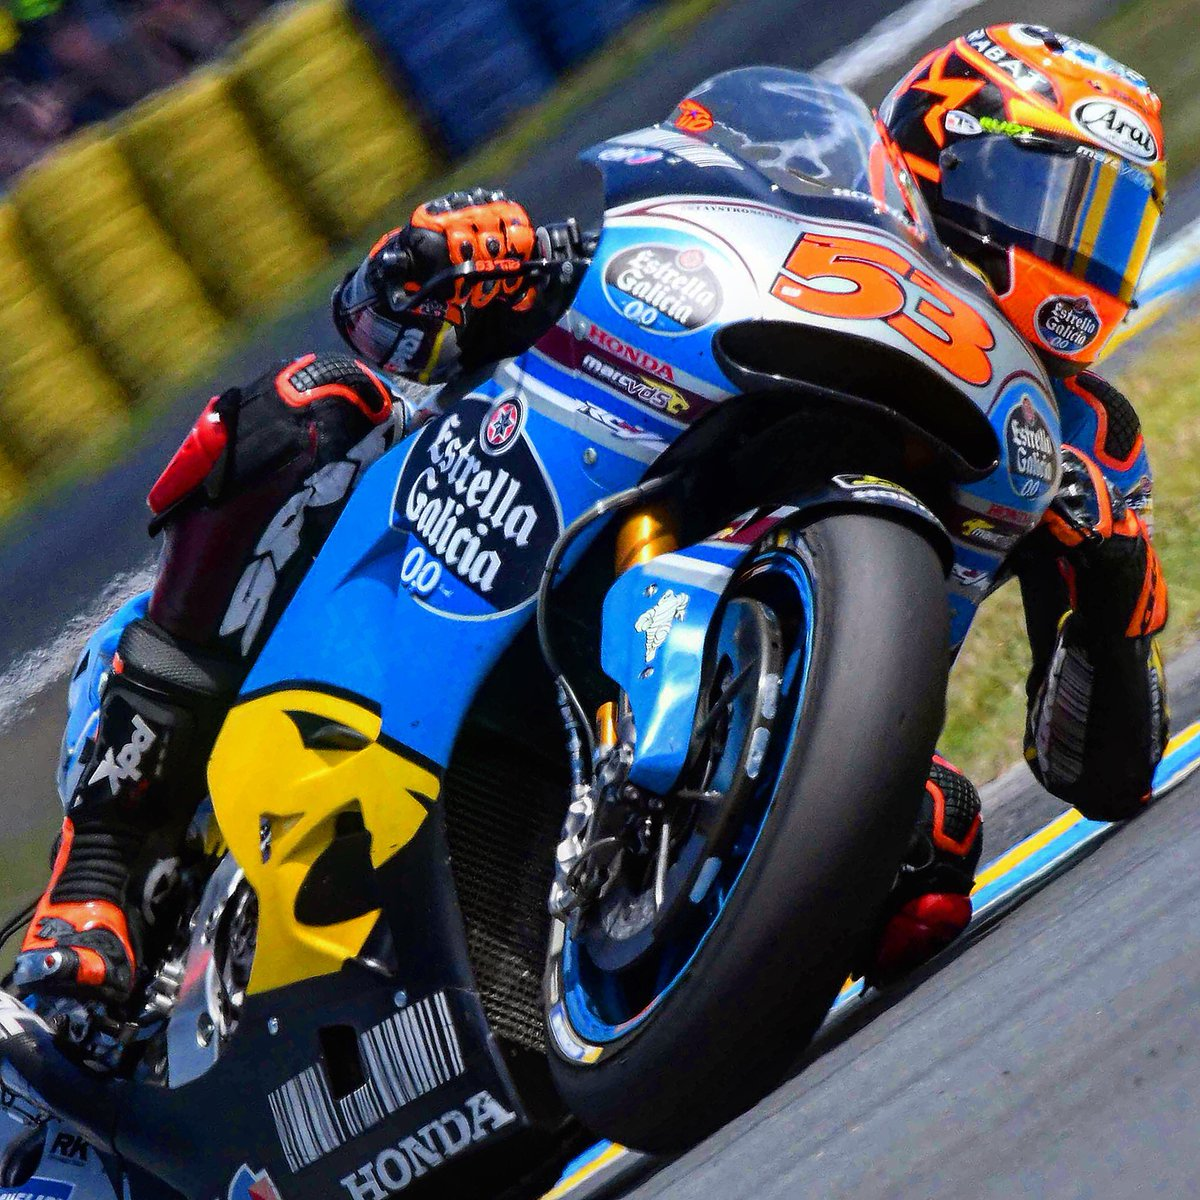 Elbow down @TitoRabat #FrenchGP @MotoGP @TeamEG00MarcVDS #speed #bikes #bikers #race #spidiwarrior #ridetrue